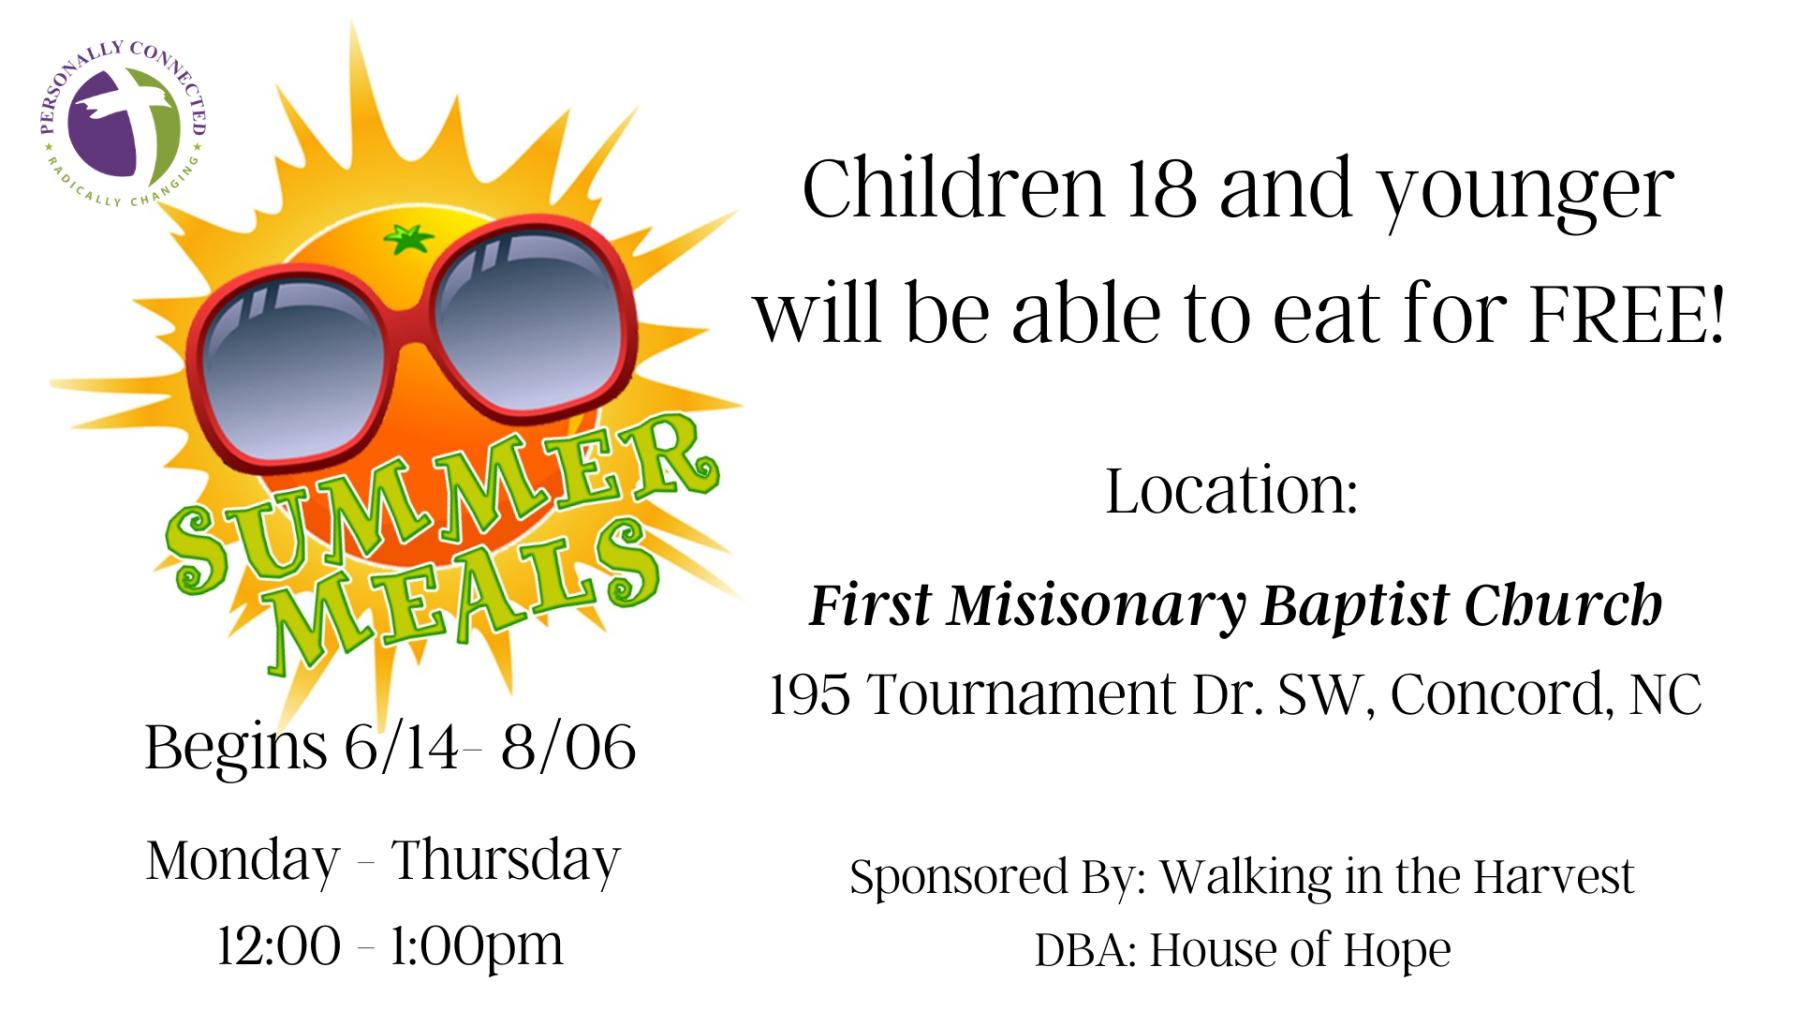 Summer Feeding Meal Program